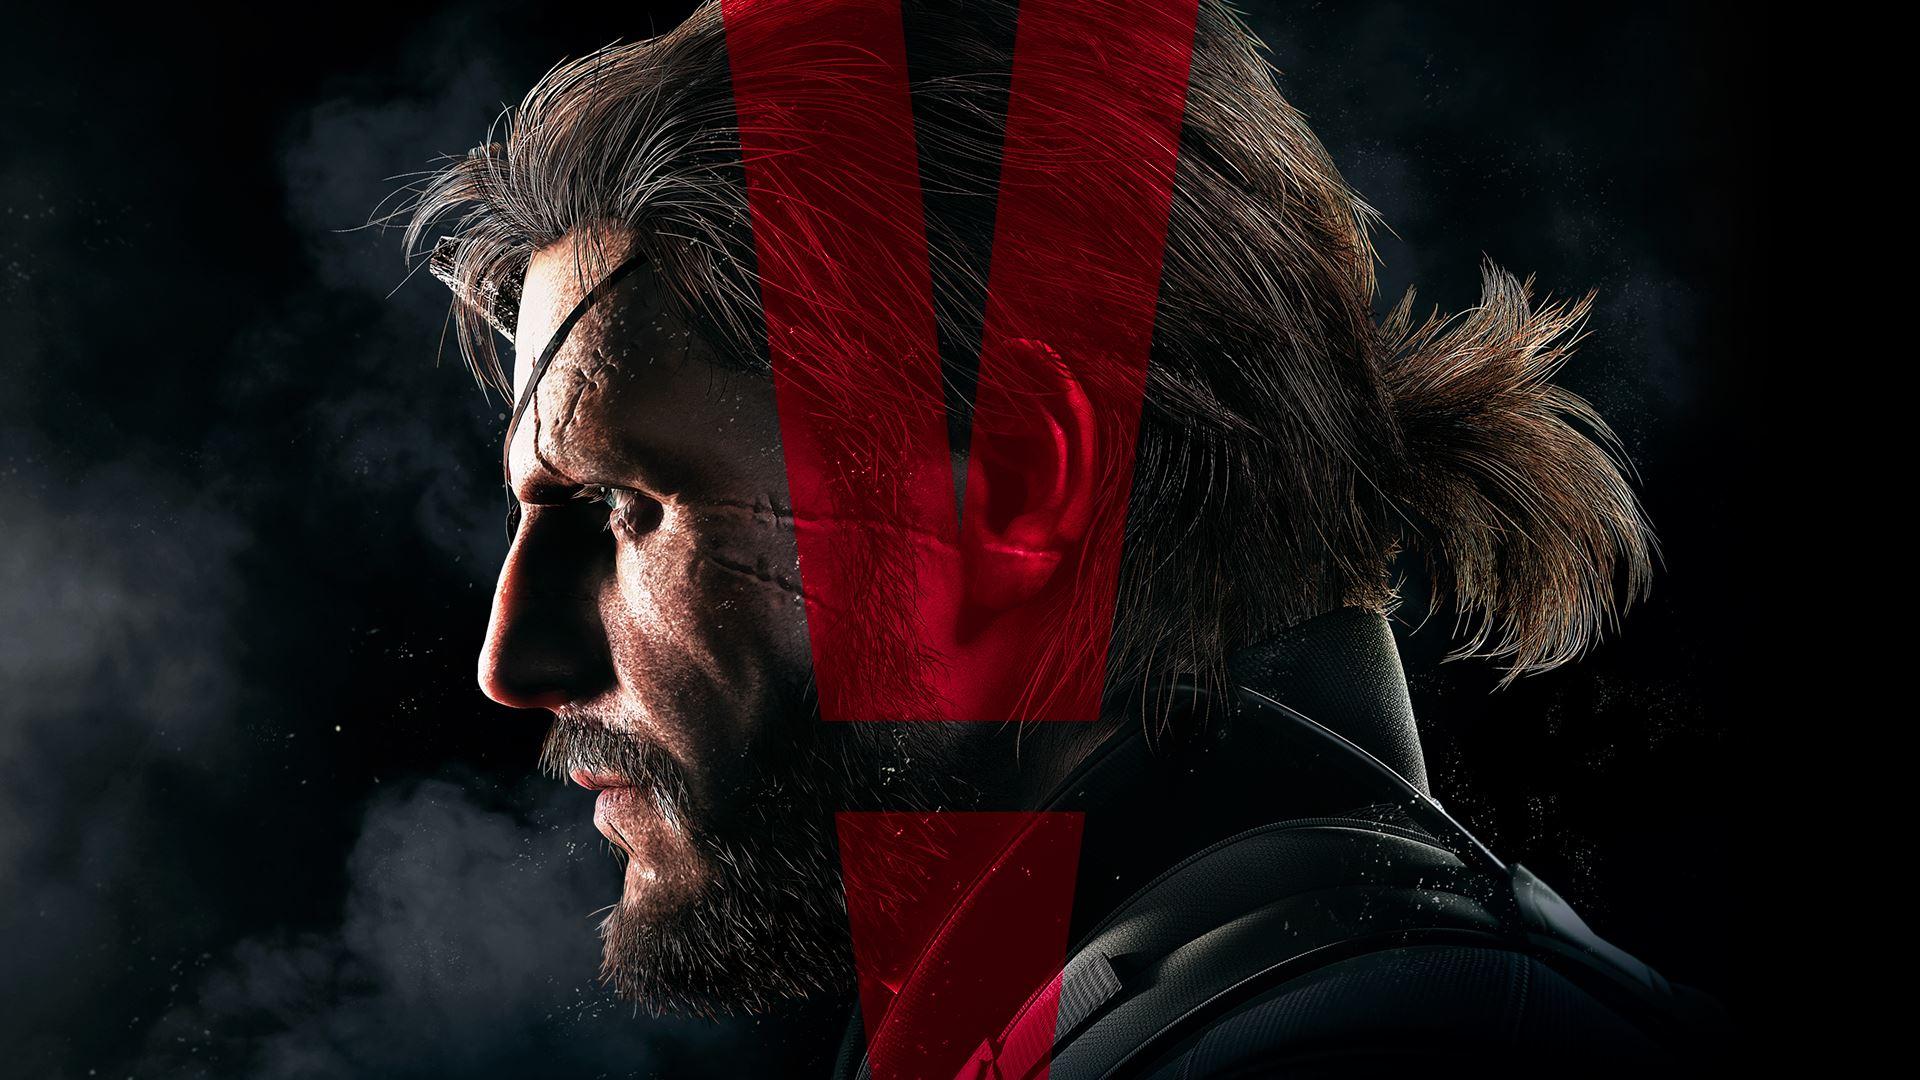 151 Metal Gear Solid V  The Phantom Pain Hd Wallpapers